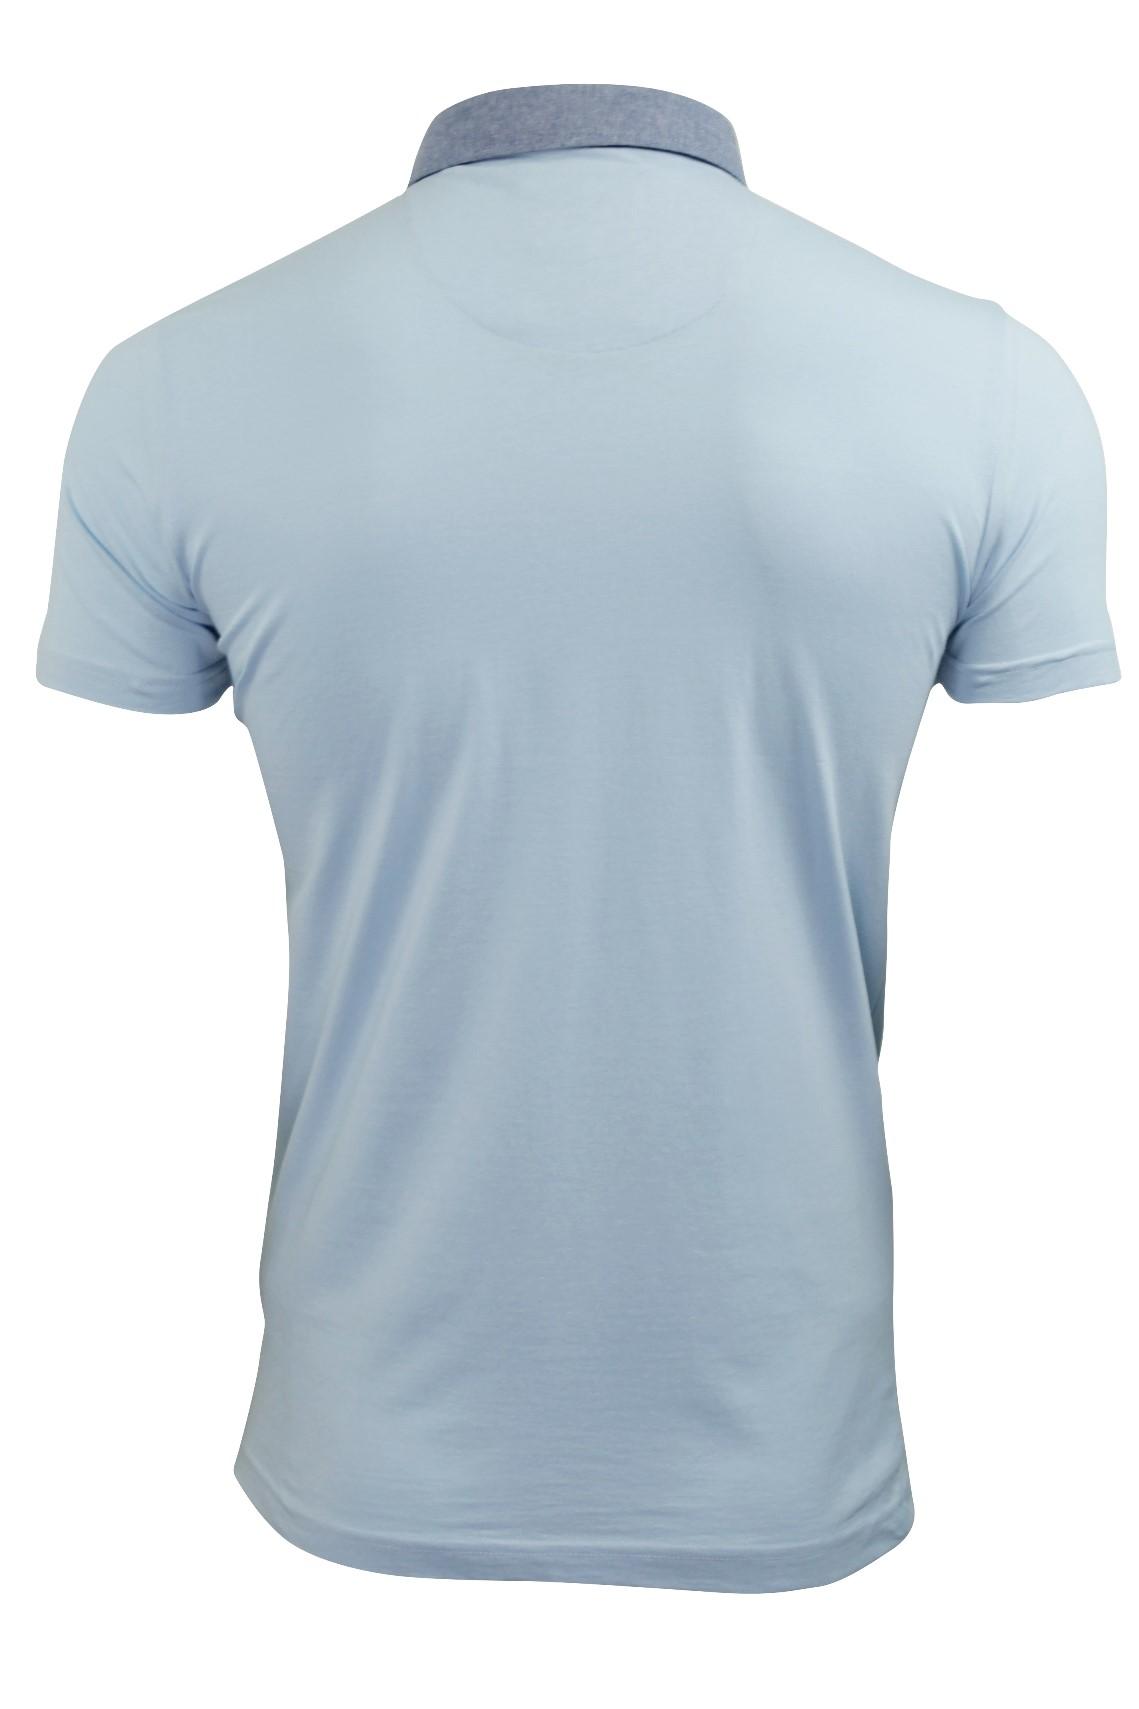 Mens-Polo-T-Shirt-Chimera-Brave-Soul-Denim-Chambray-Collar-Short-Sleeved-Cotton thumbnail 29